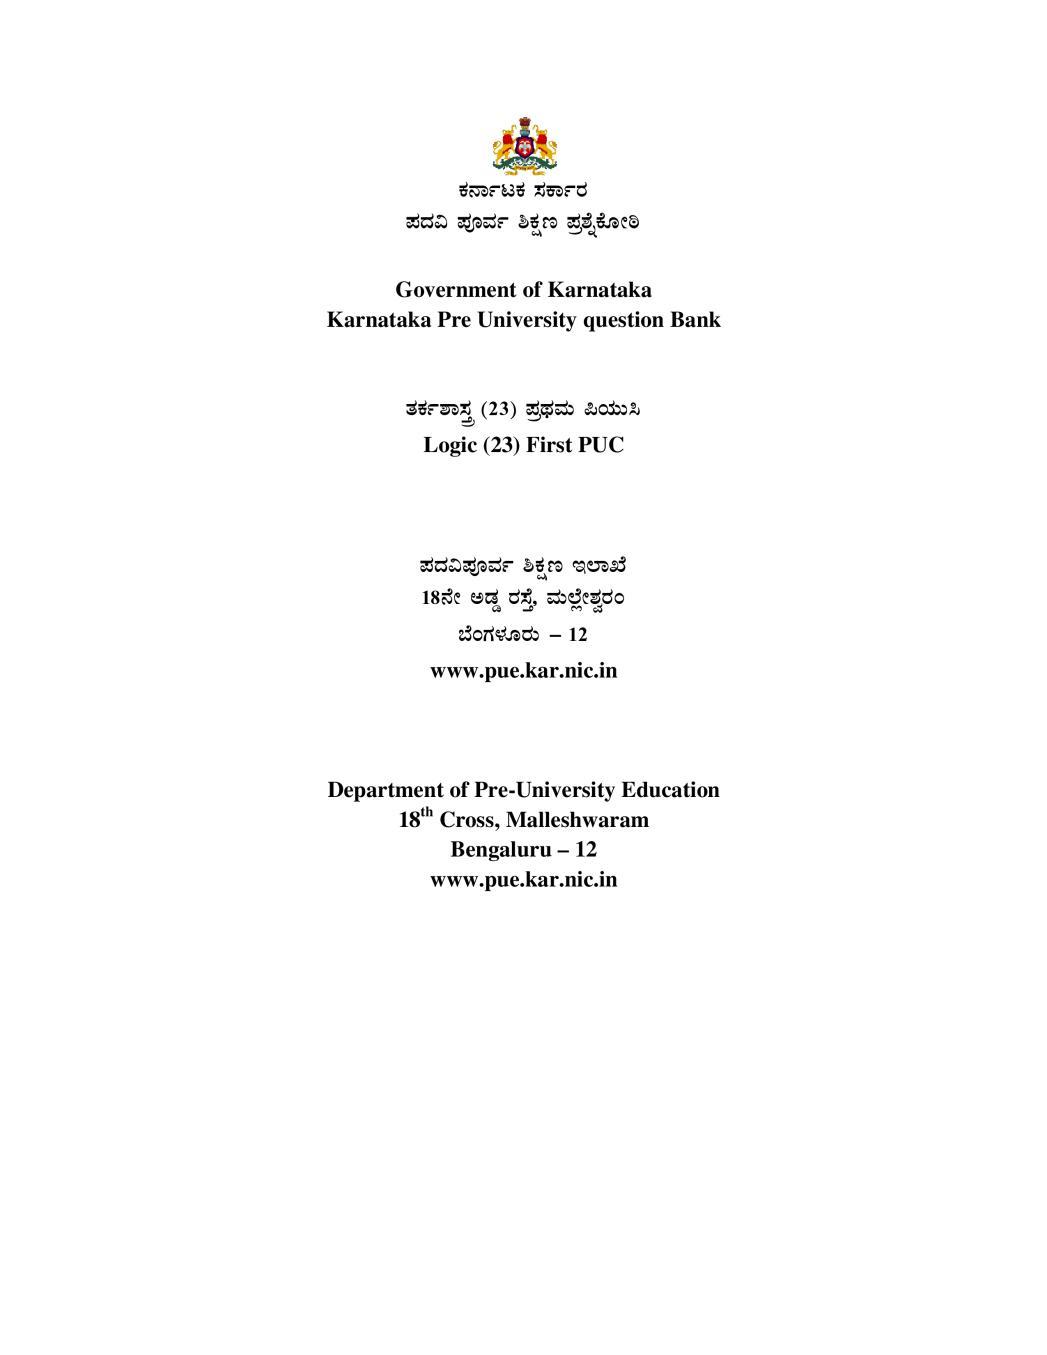 Karnataka 1st PUC Question Bank for Logic 2017-18 - Page 1